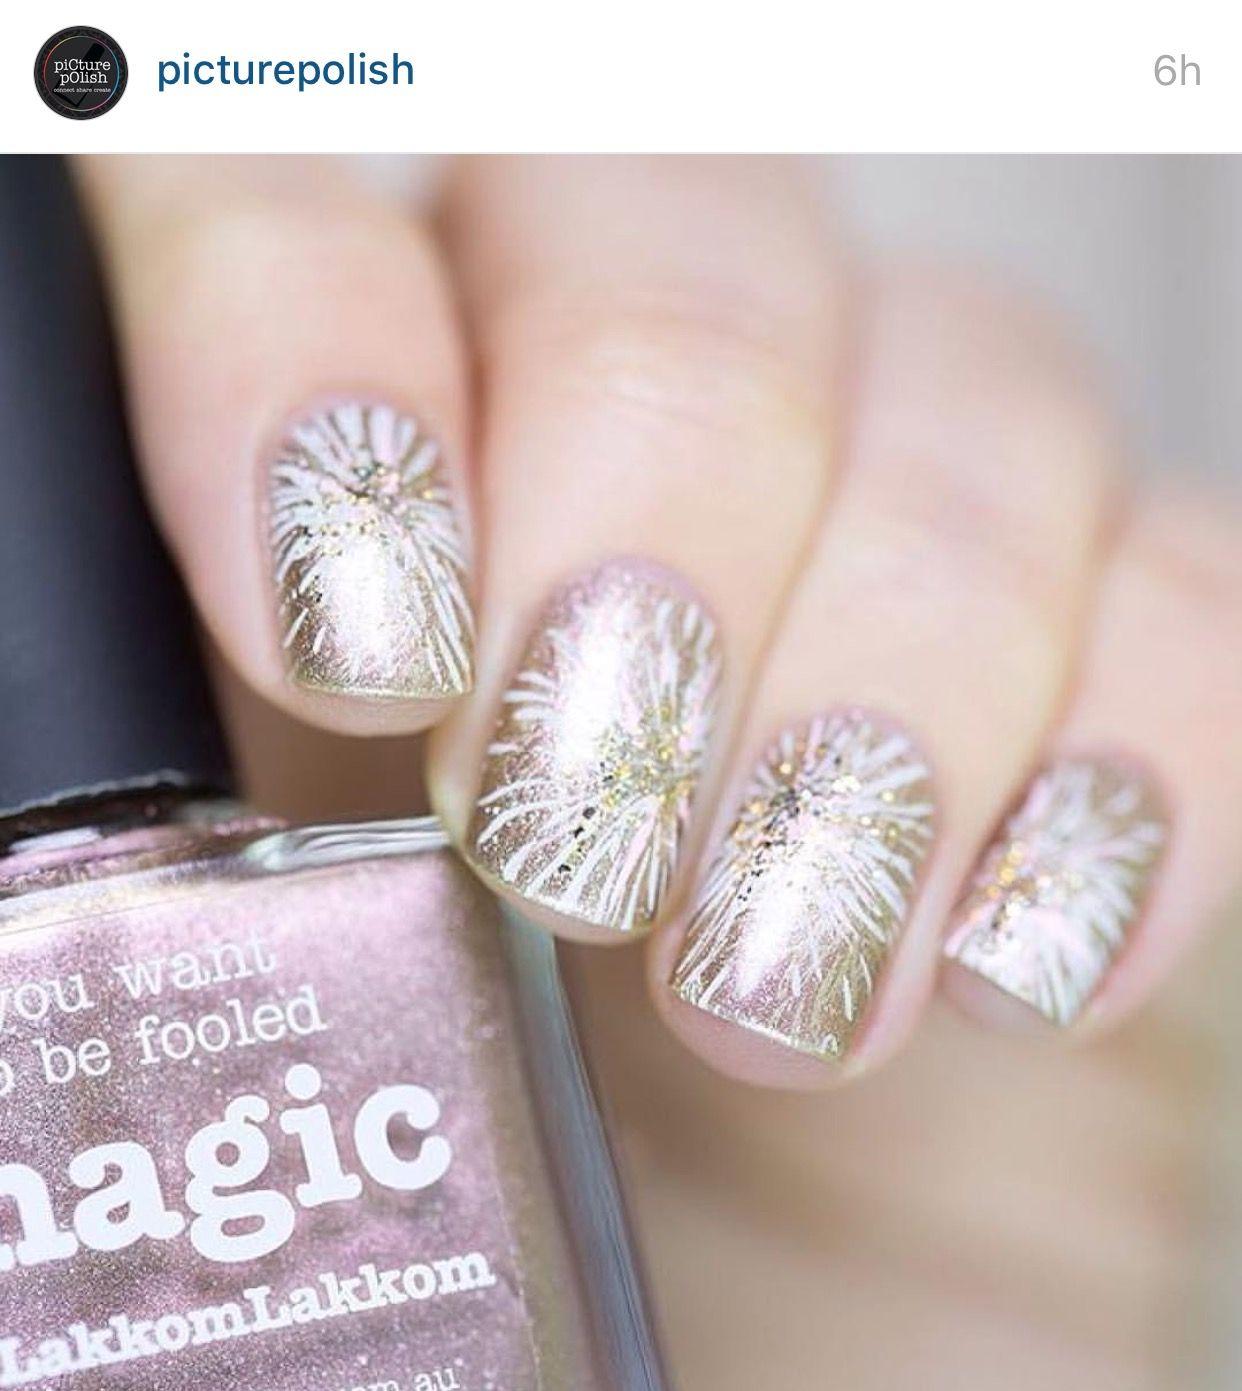 Pins check out www mynailpolishobsession com for more nail art ideas - Explore Firework Nail Art Nail Arts And More